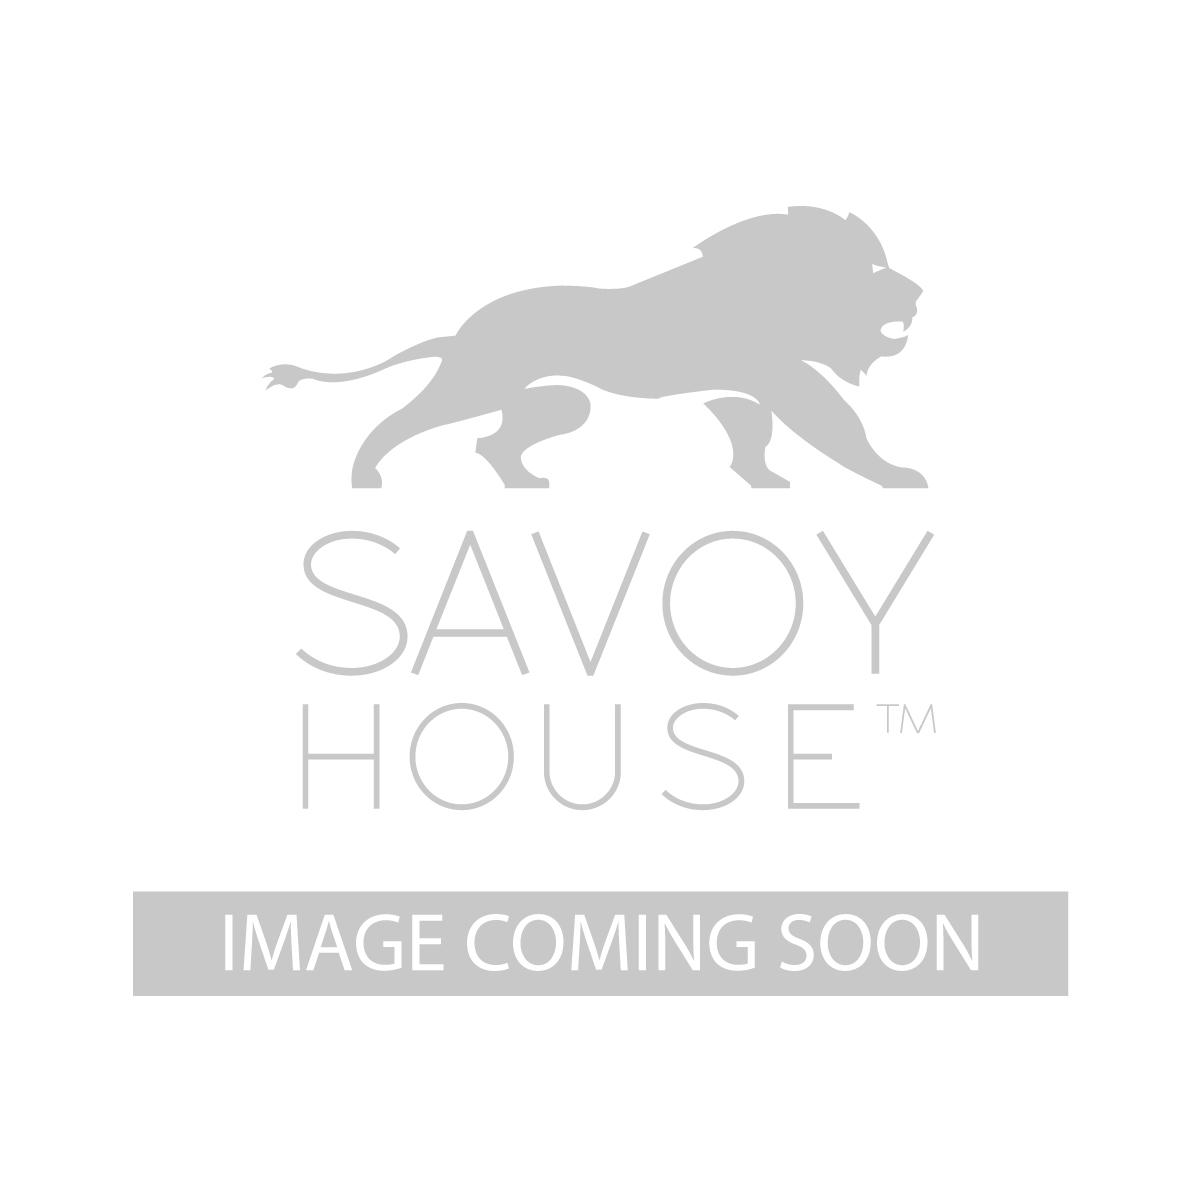 8 1780 2 79 Lansing 2 Light Bath Bar By Savoy House